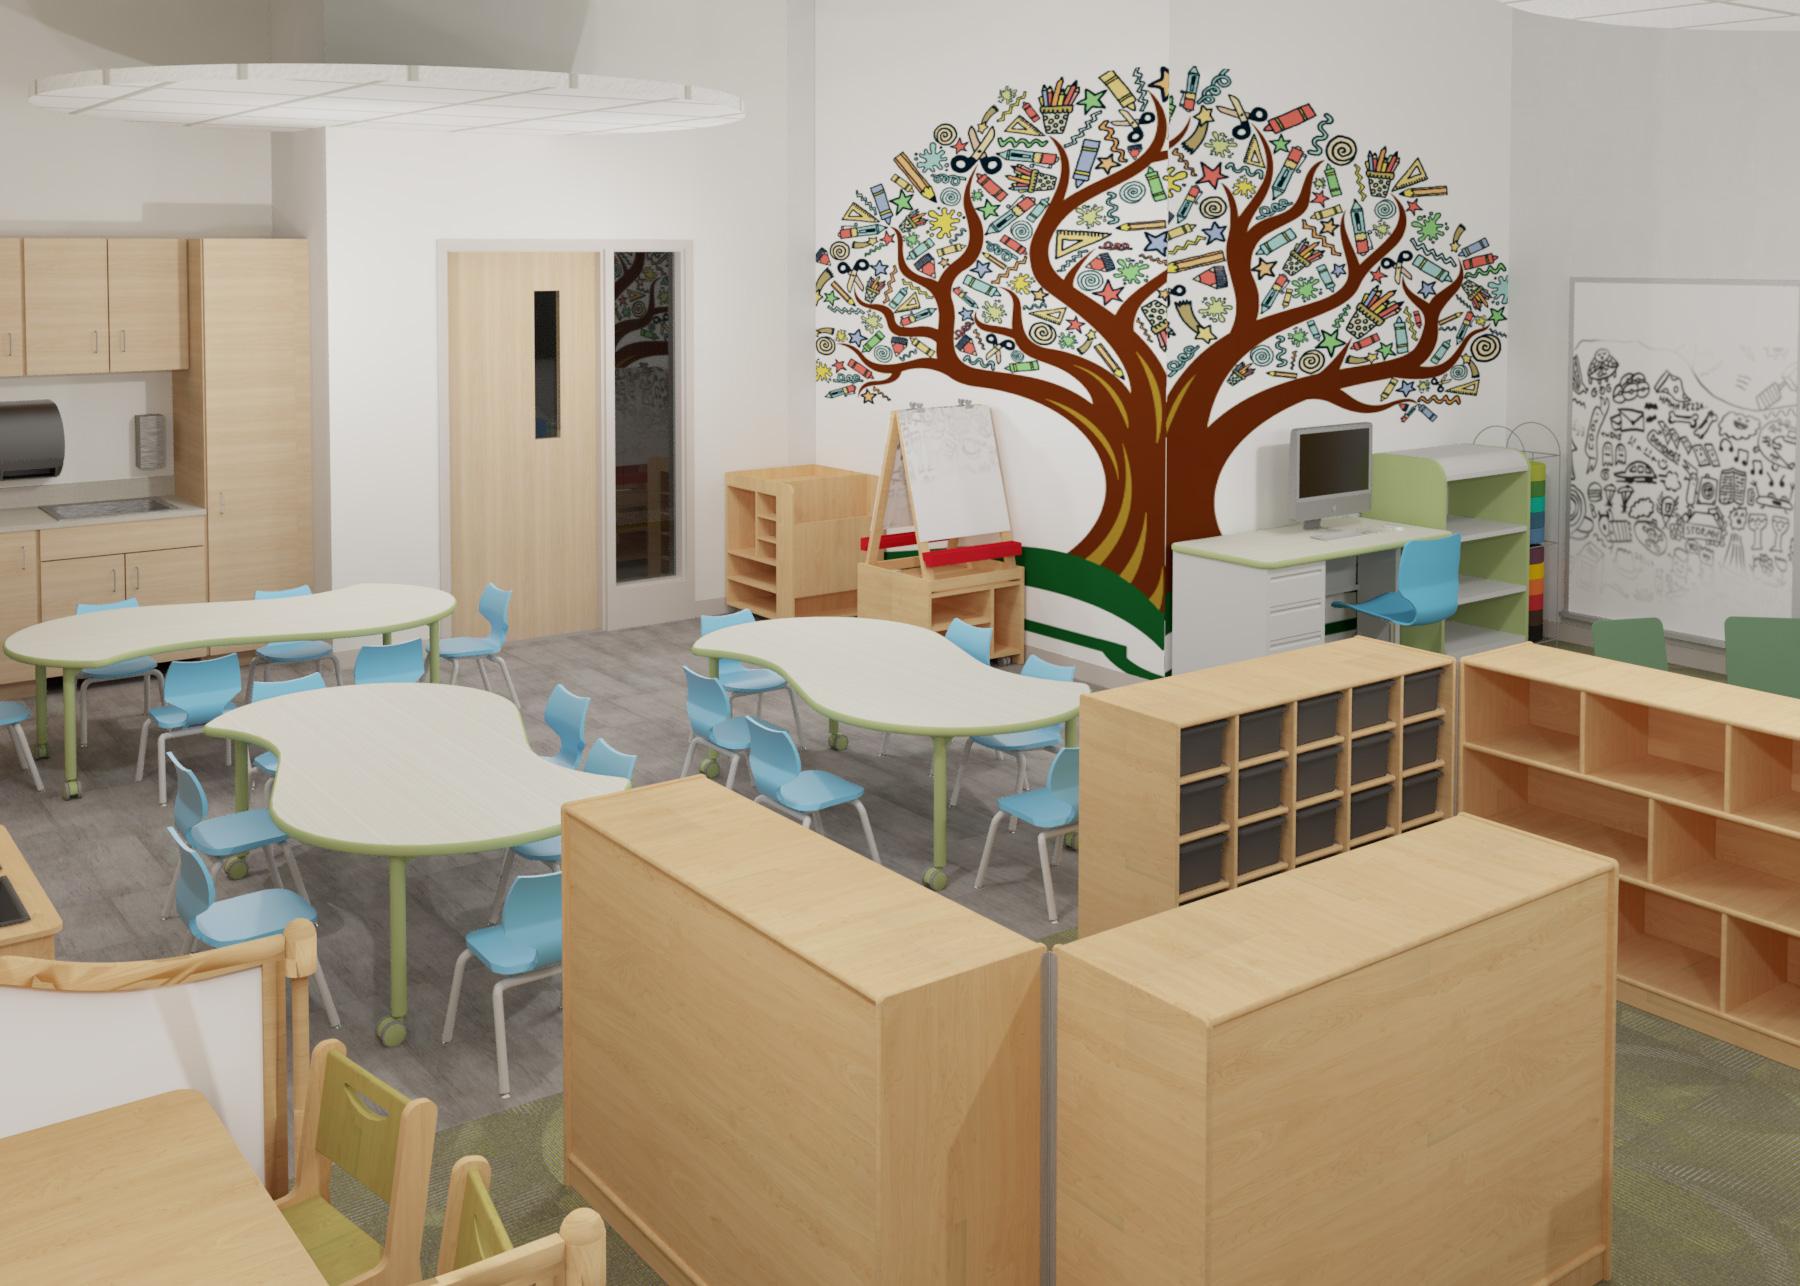 Bethel Classroom